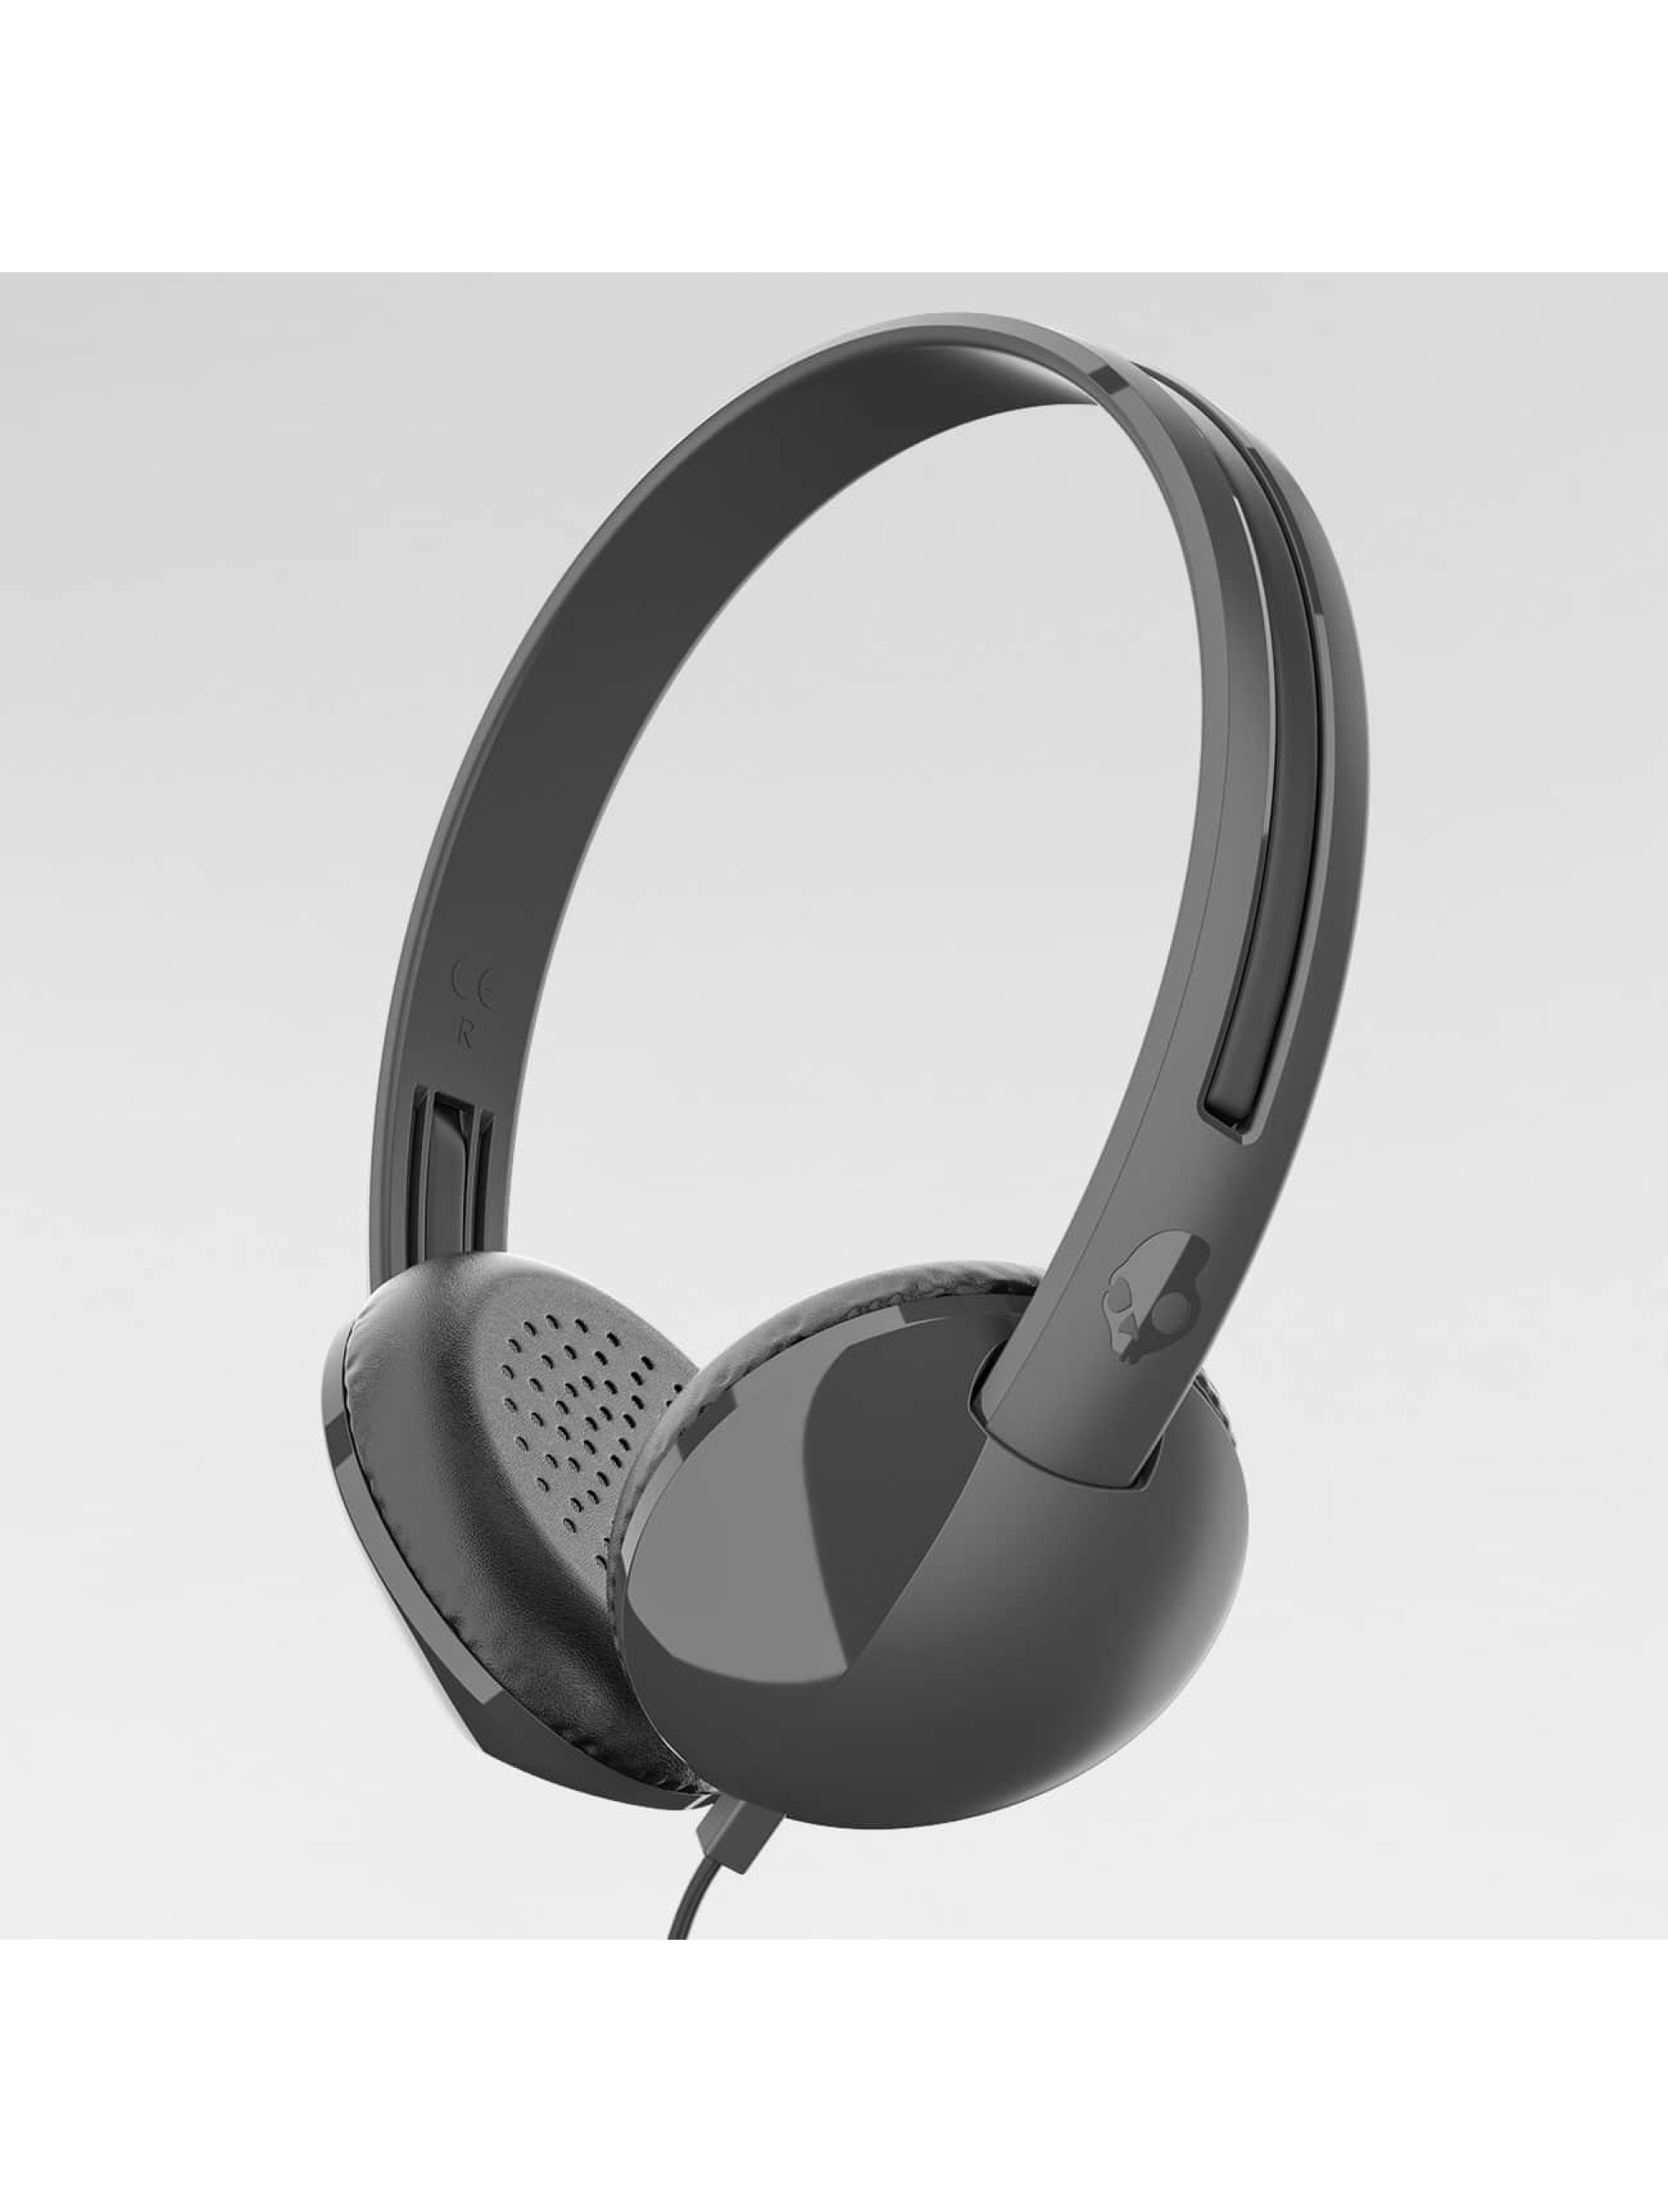 Skullcandy Kopfhörer Stim Mic 1 On Ear schwarz